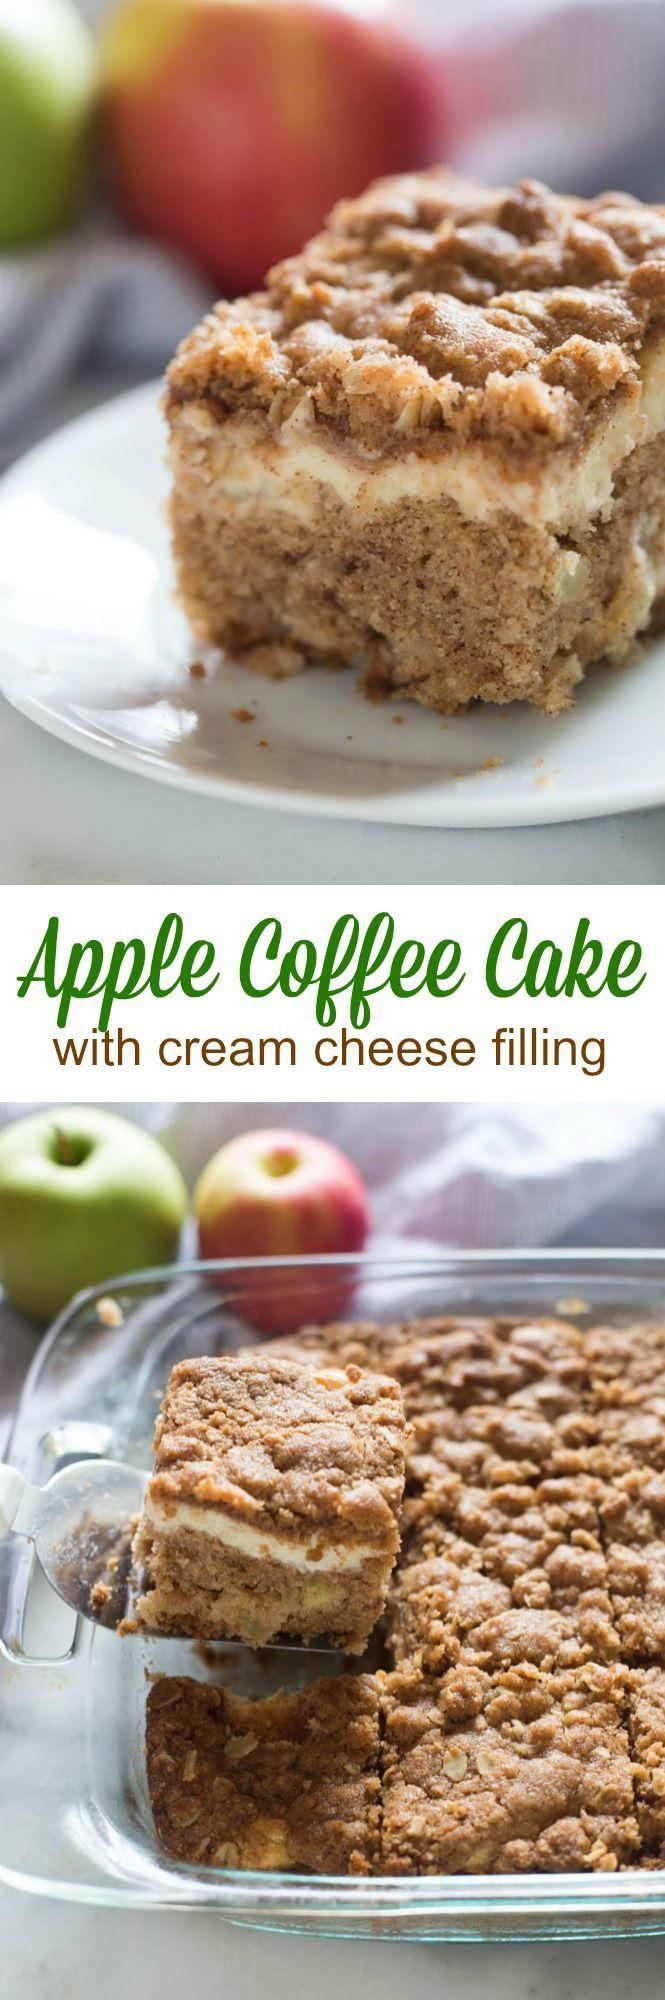 Best 25+ Apple coffee cakes ideas on Pinterest | Cream ...